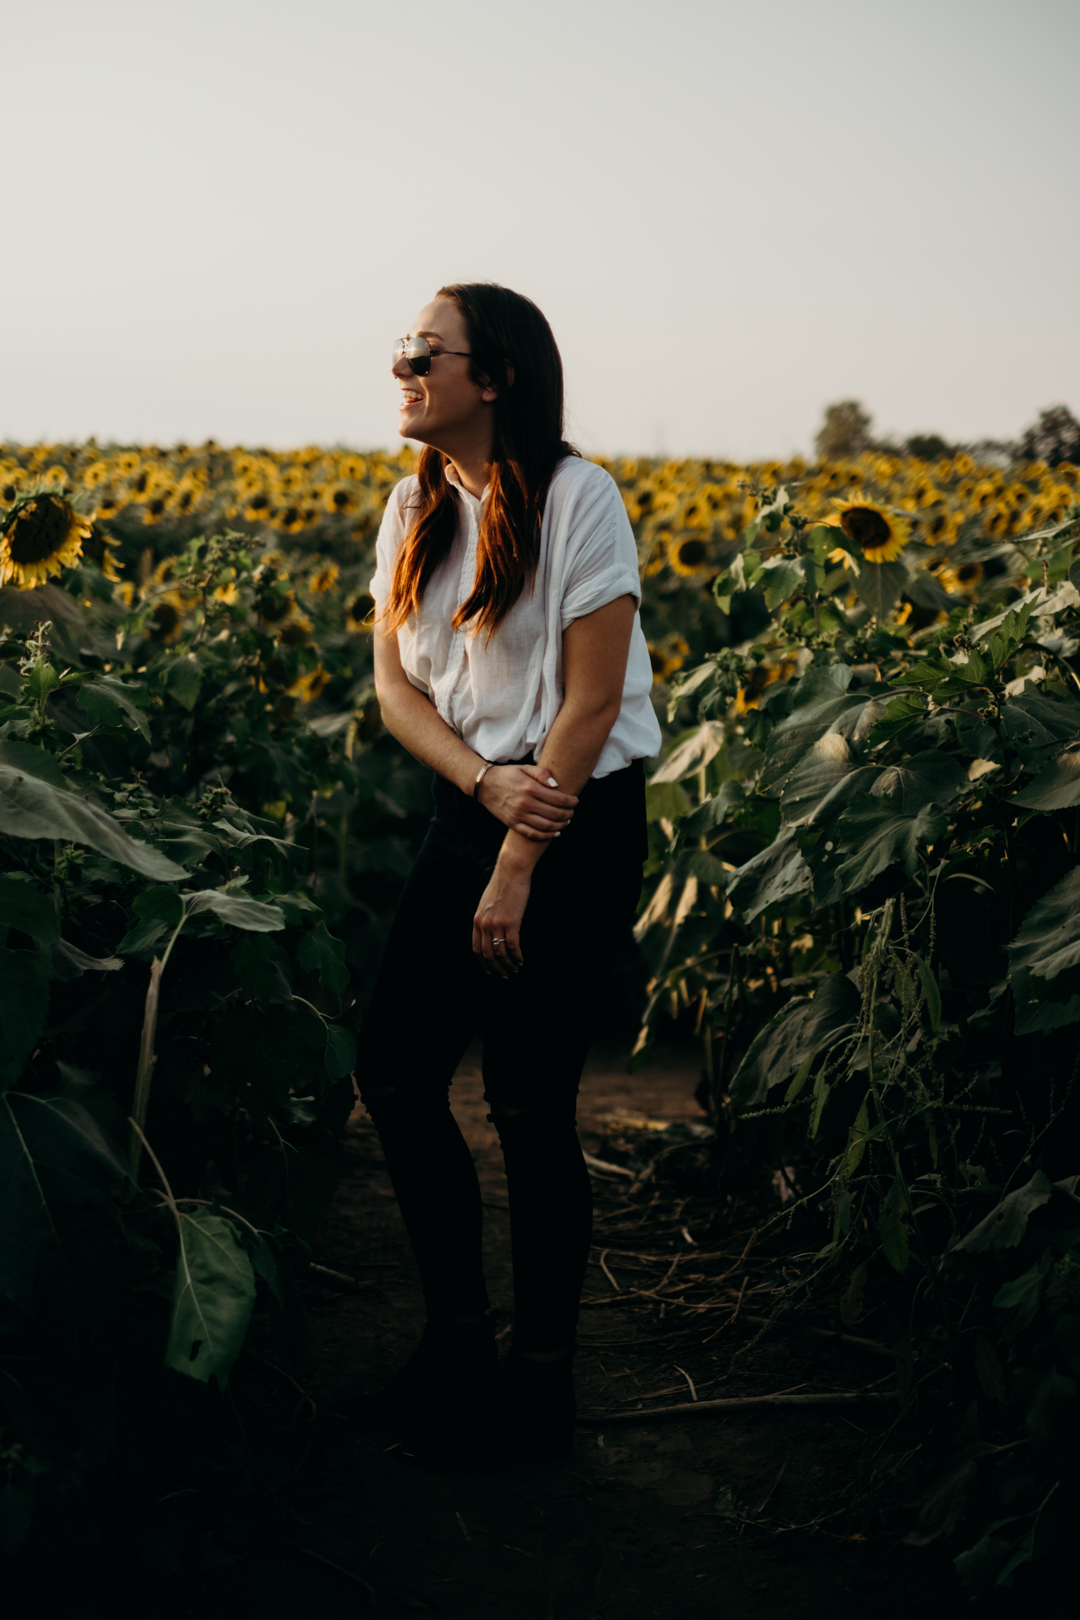 20170909_Grinters Farms Sunflower Fields Lawrence Kansas__14.jpg